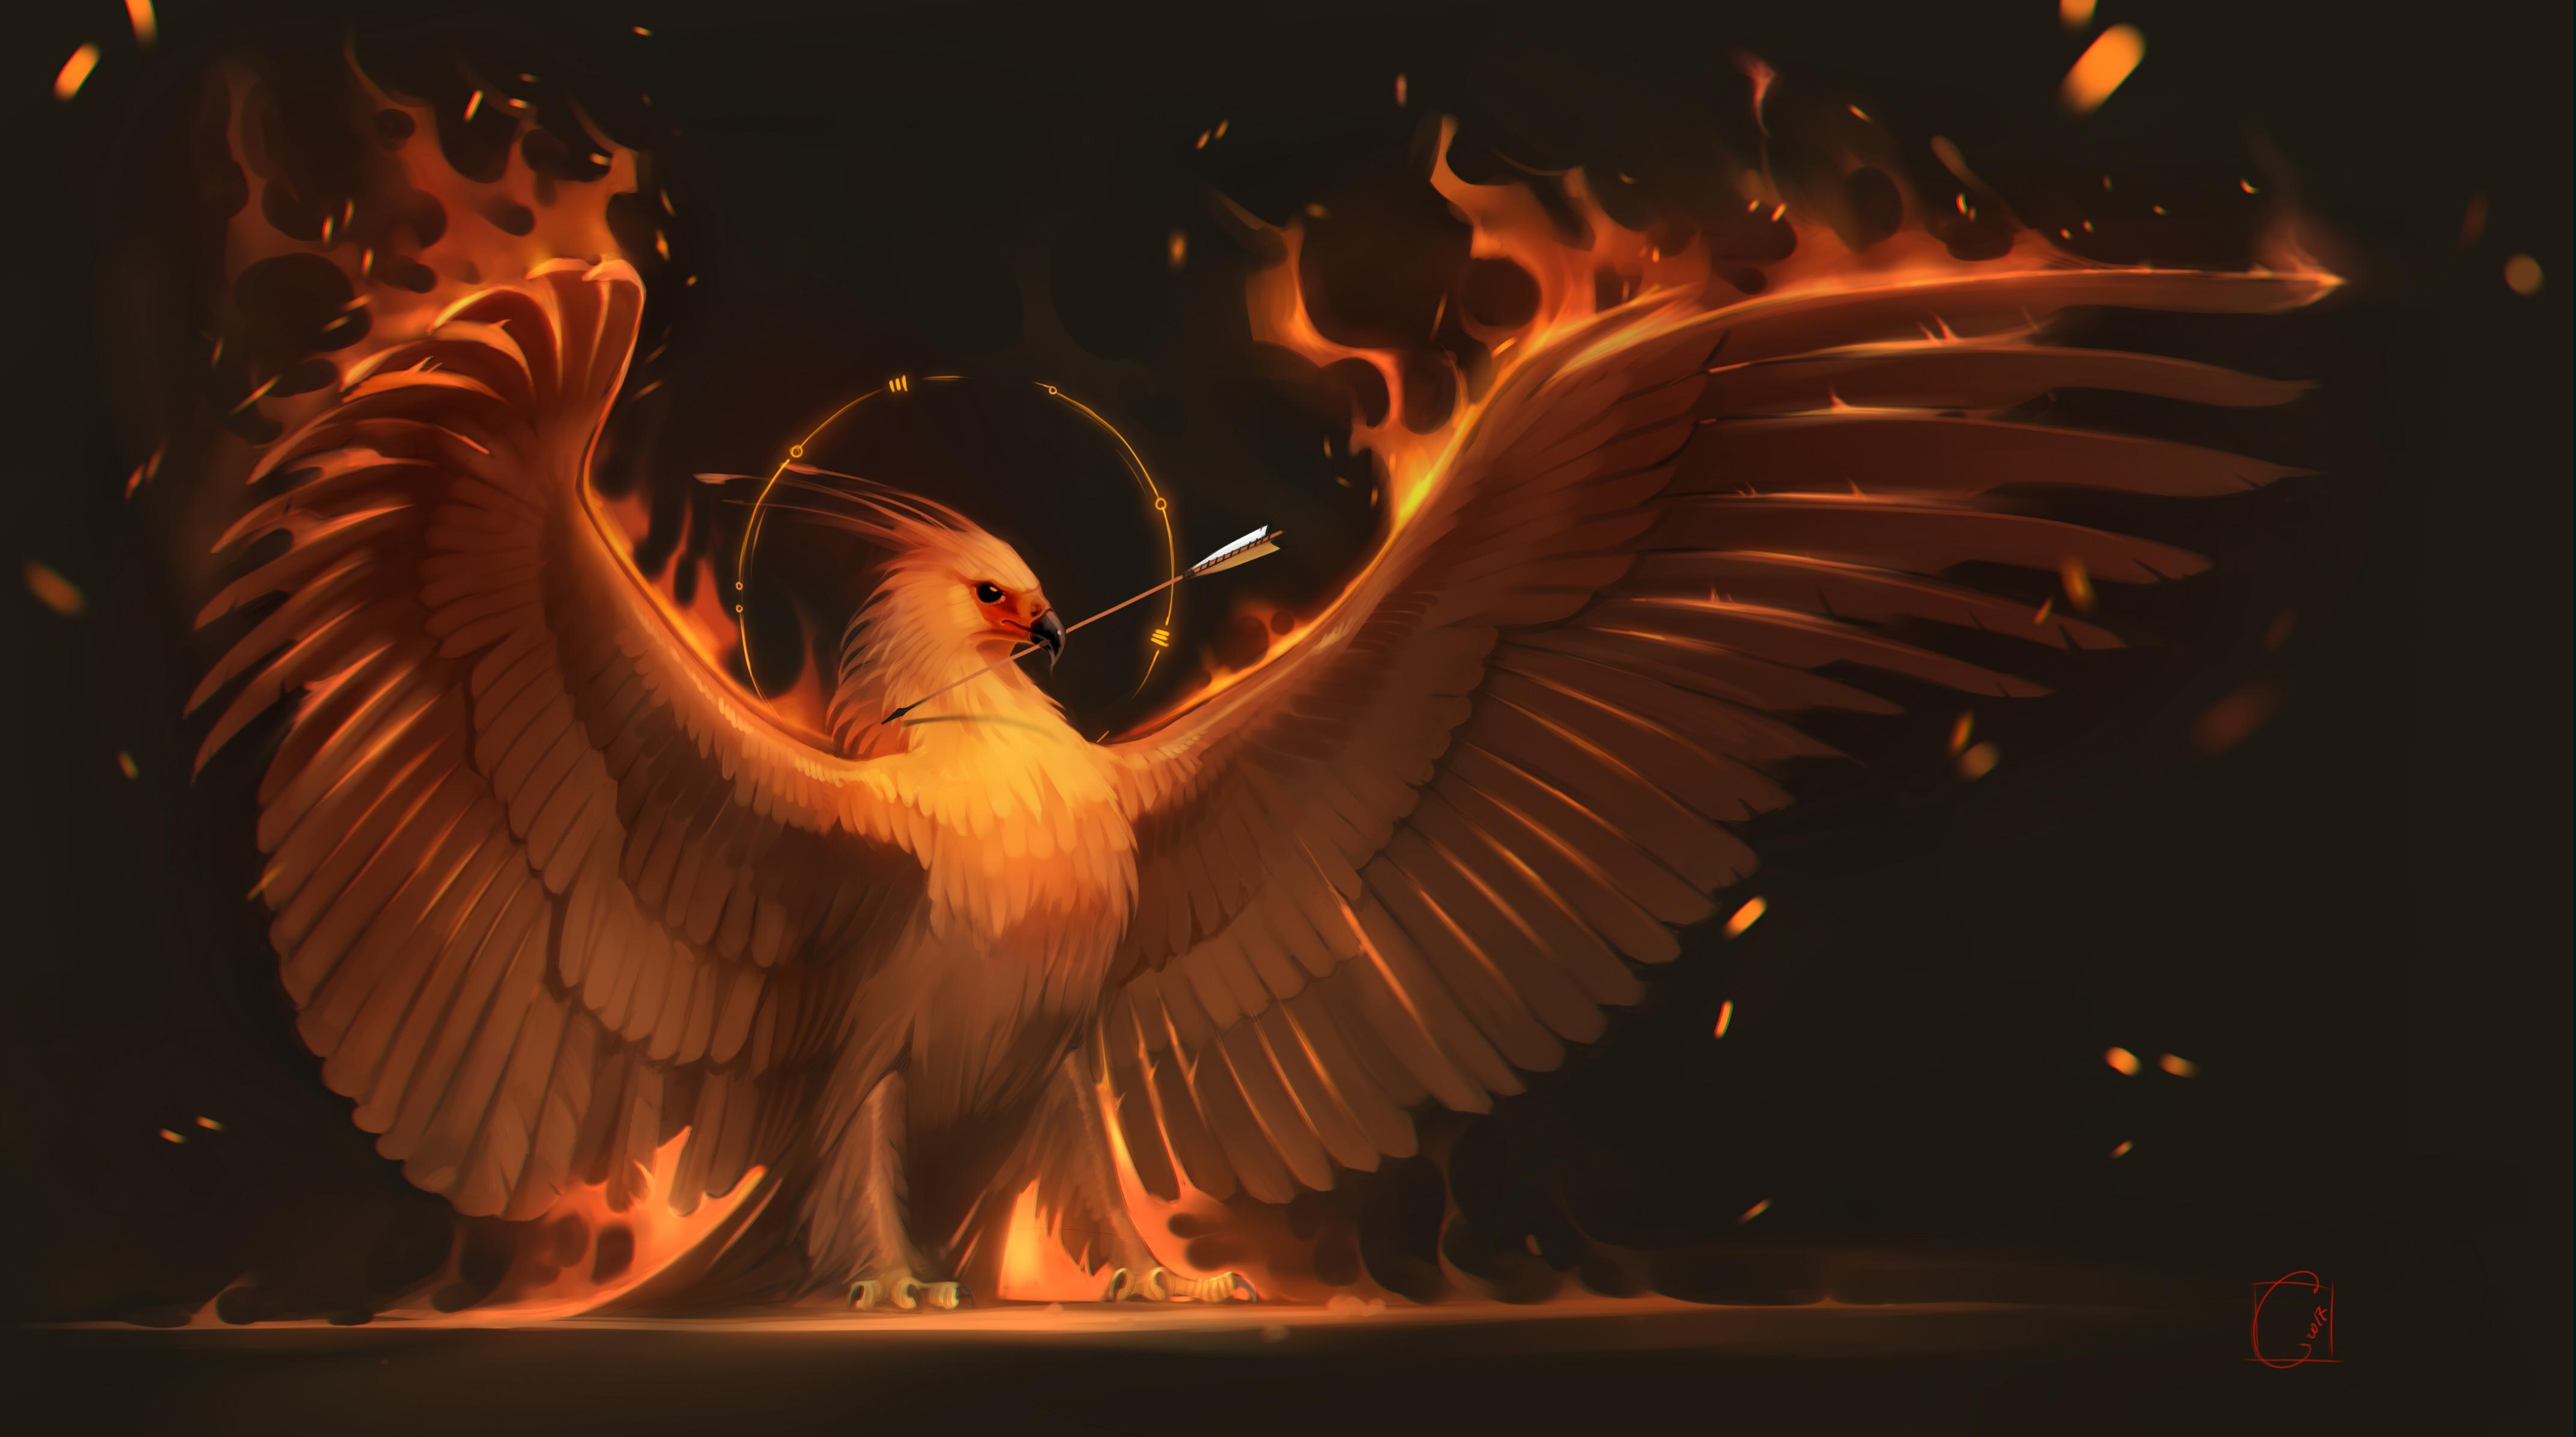 Phoenix Hd Artist 4k Wallpapers Images Backgrounds